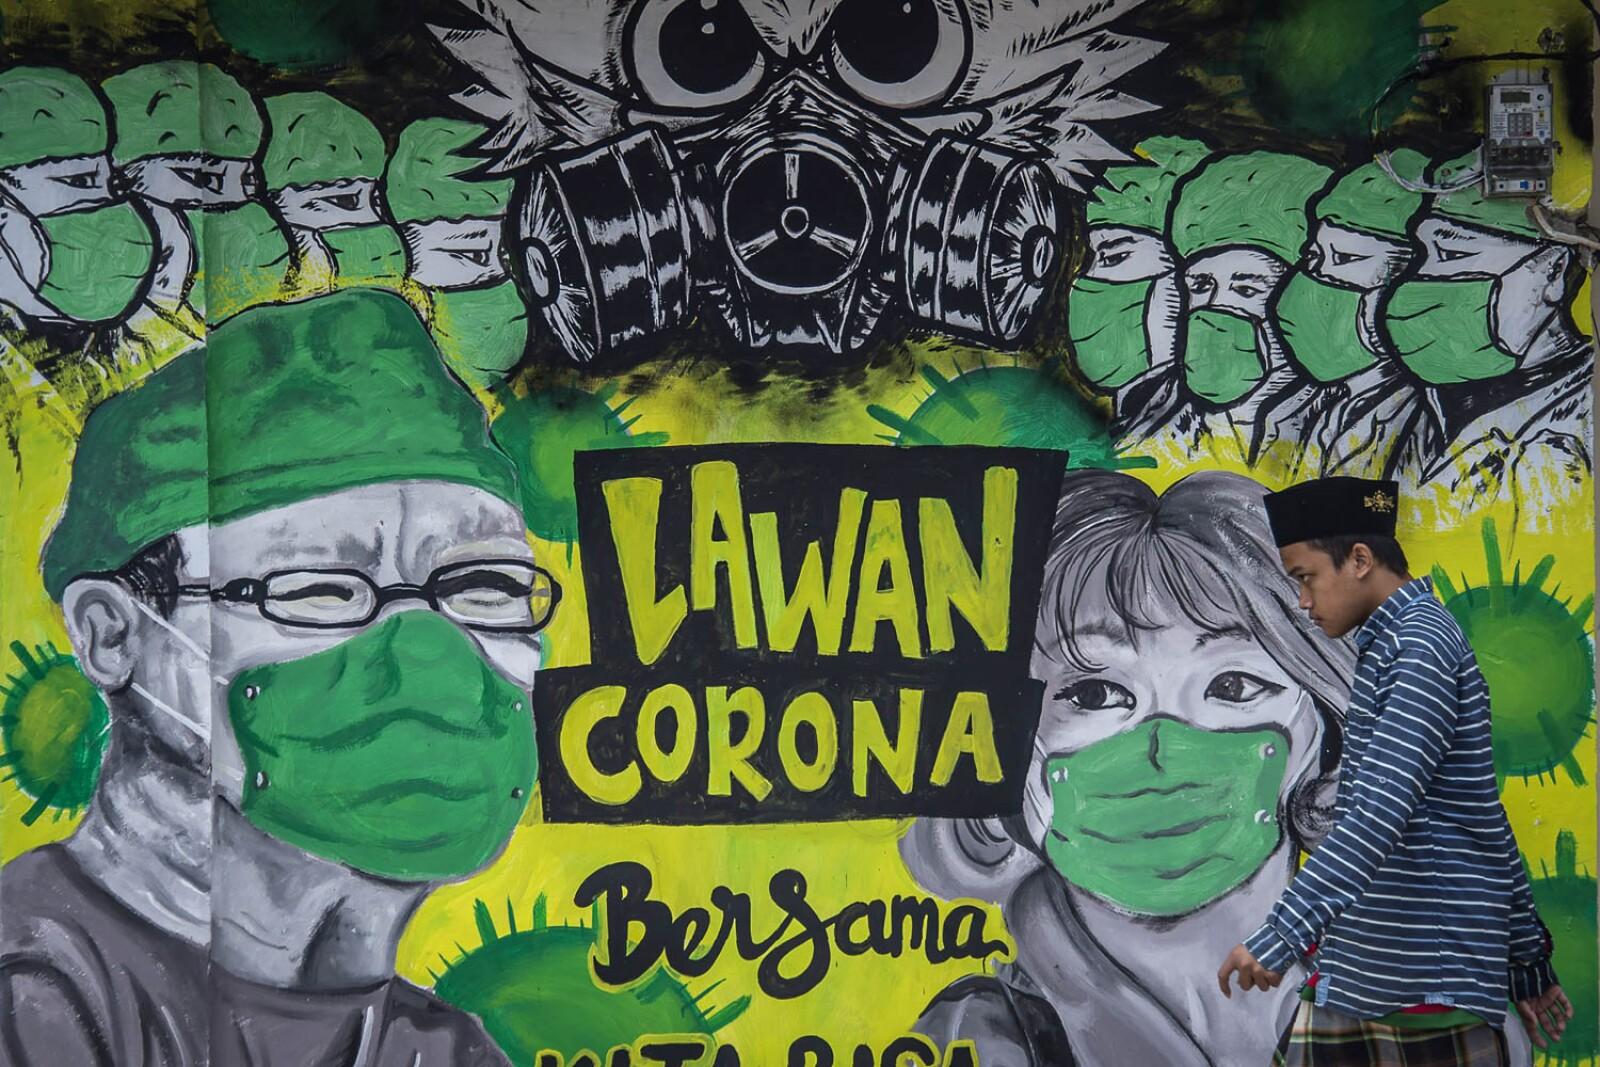 Héroes frente al coronavirus